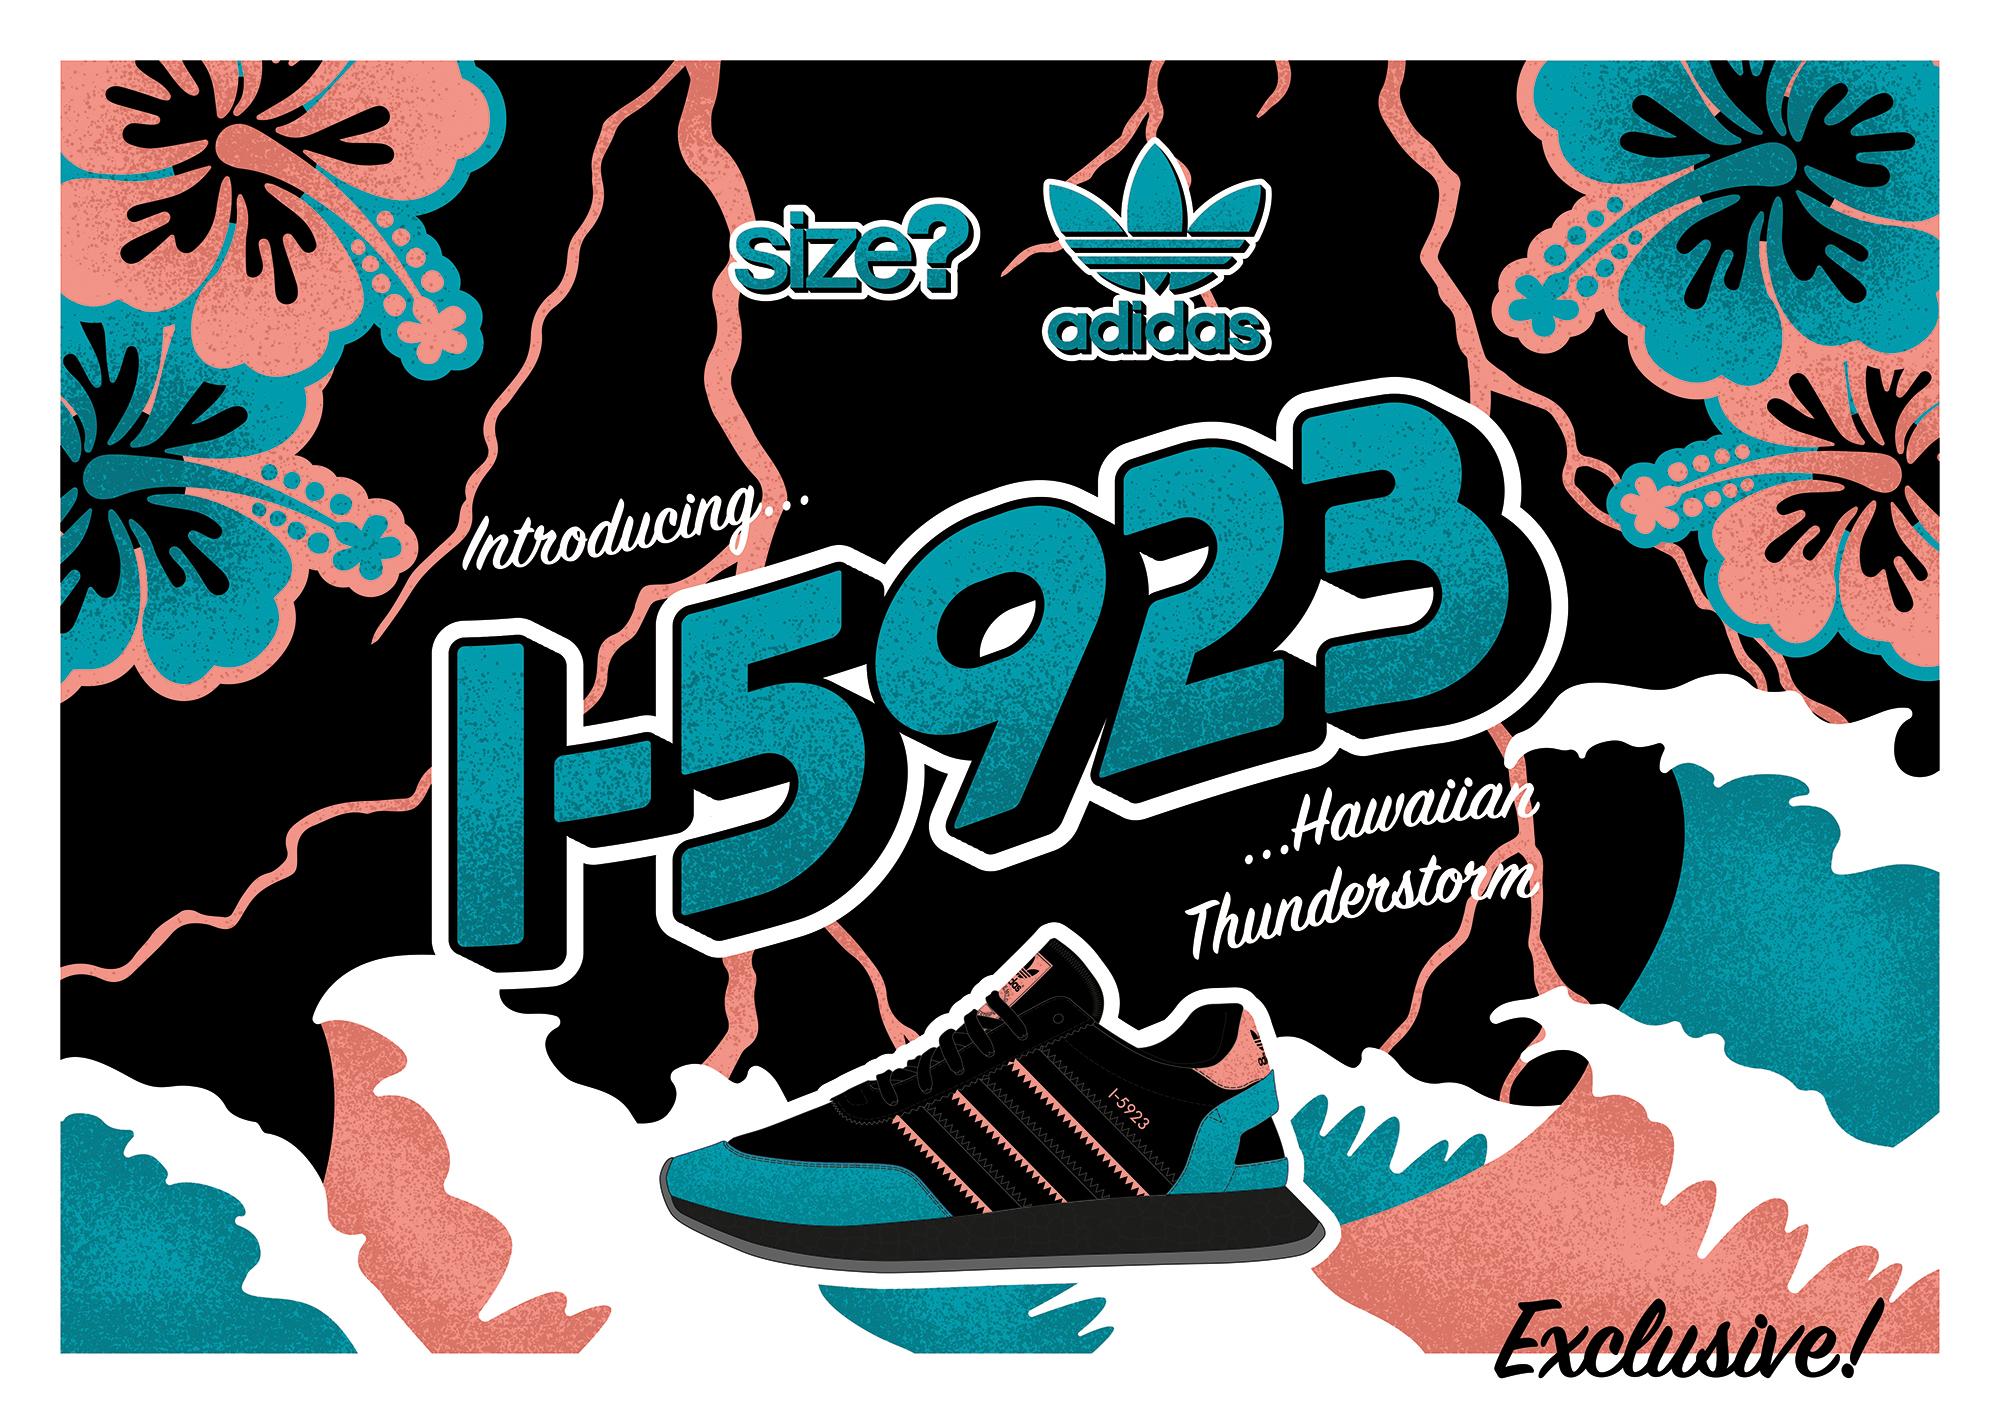 adidas Originals I-5923 'Hawaiian Thunderstorm' – size? Exclusive